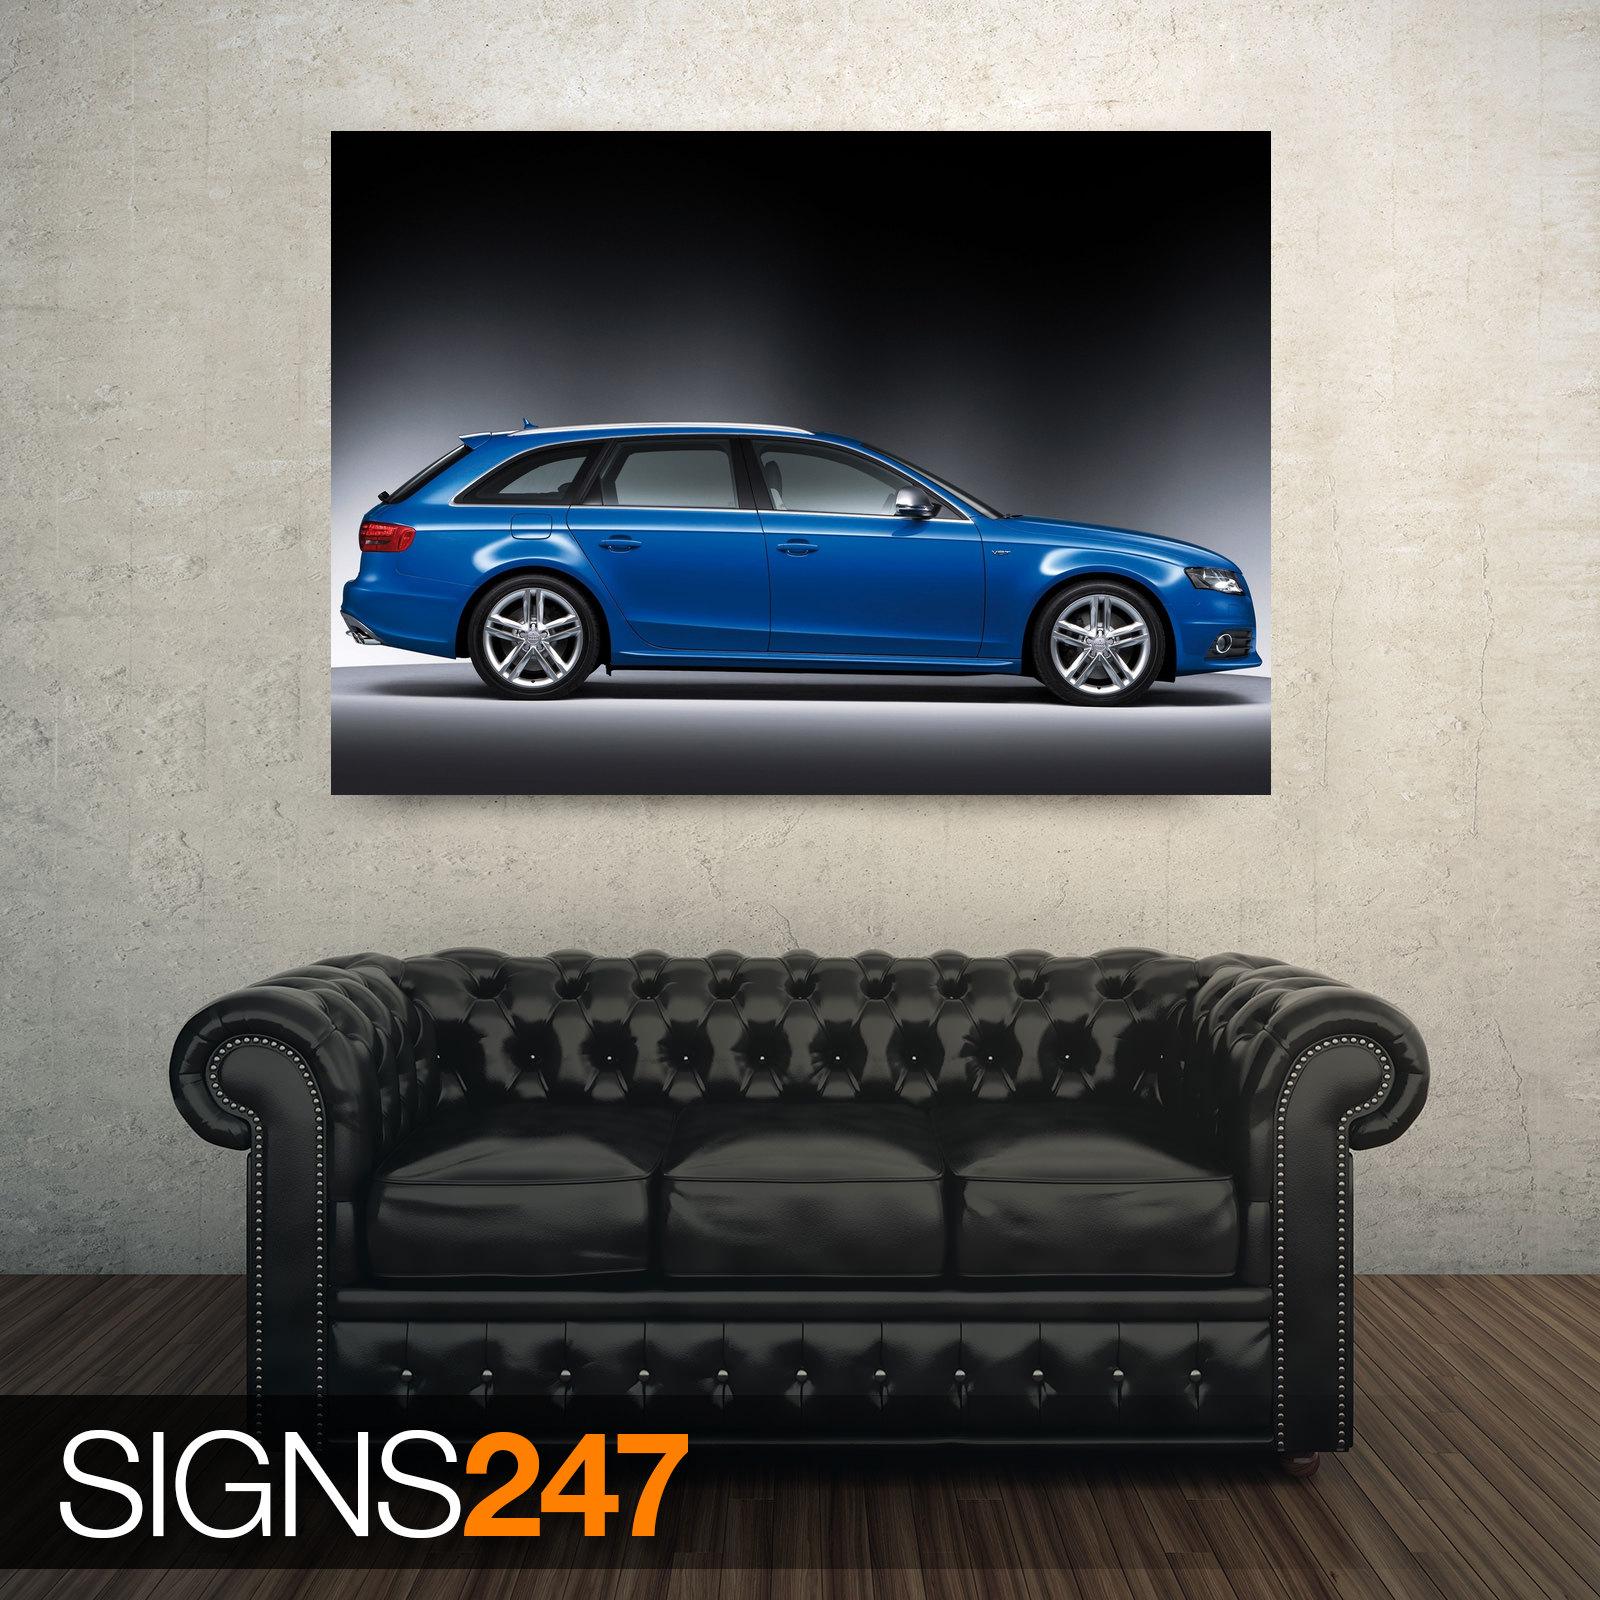 AUDI S4 AVANT CAR 4 (AC993) CAR POSTER